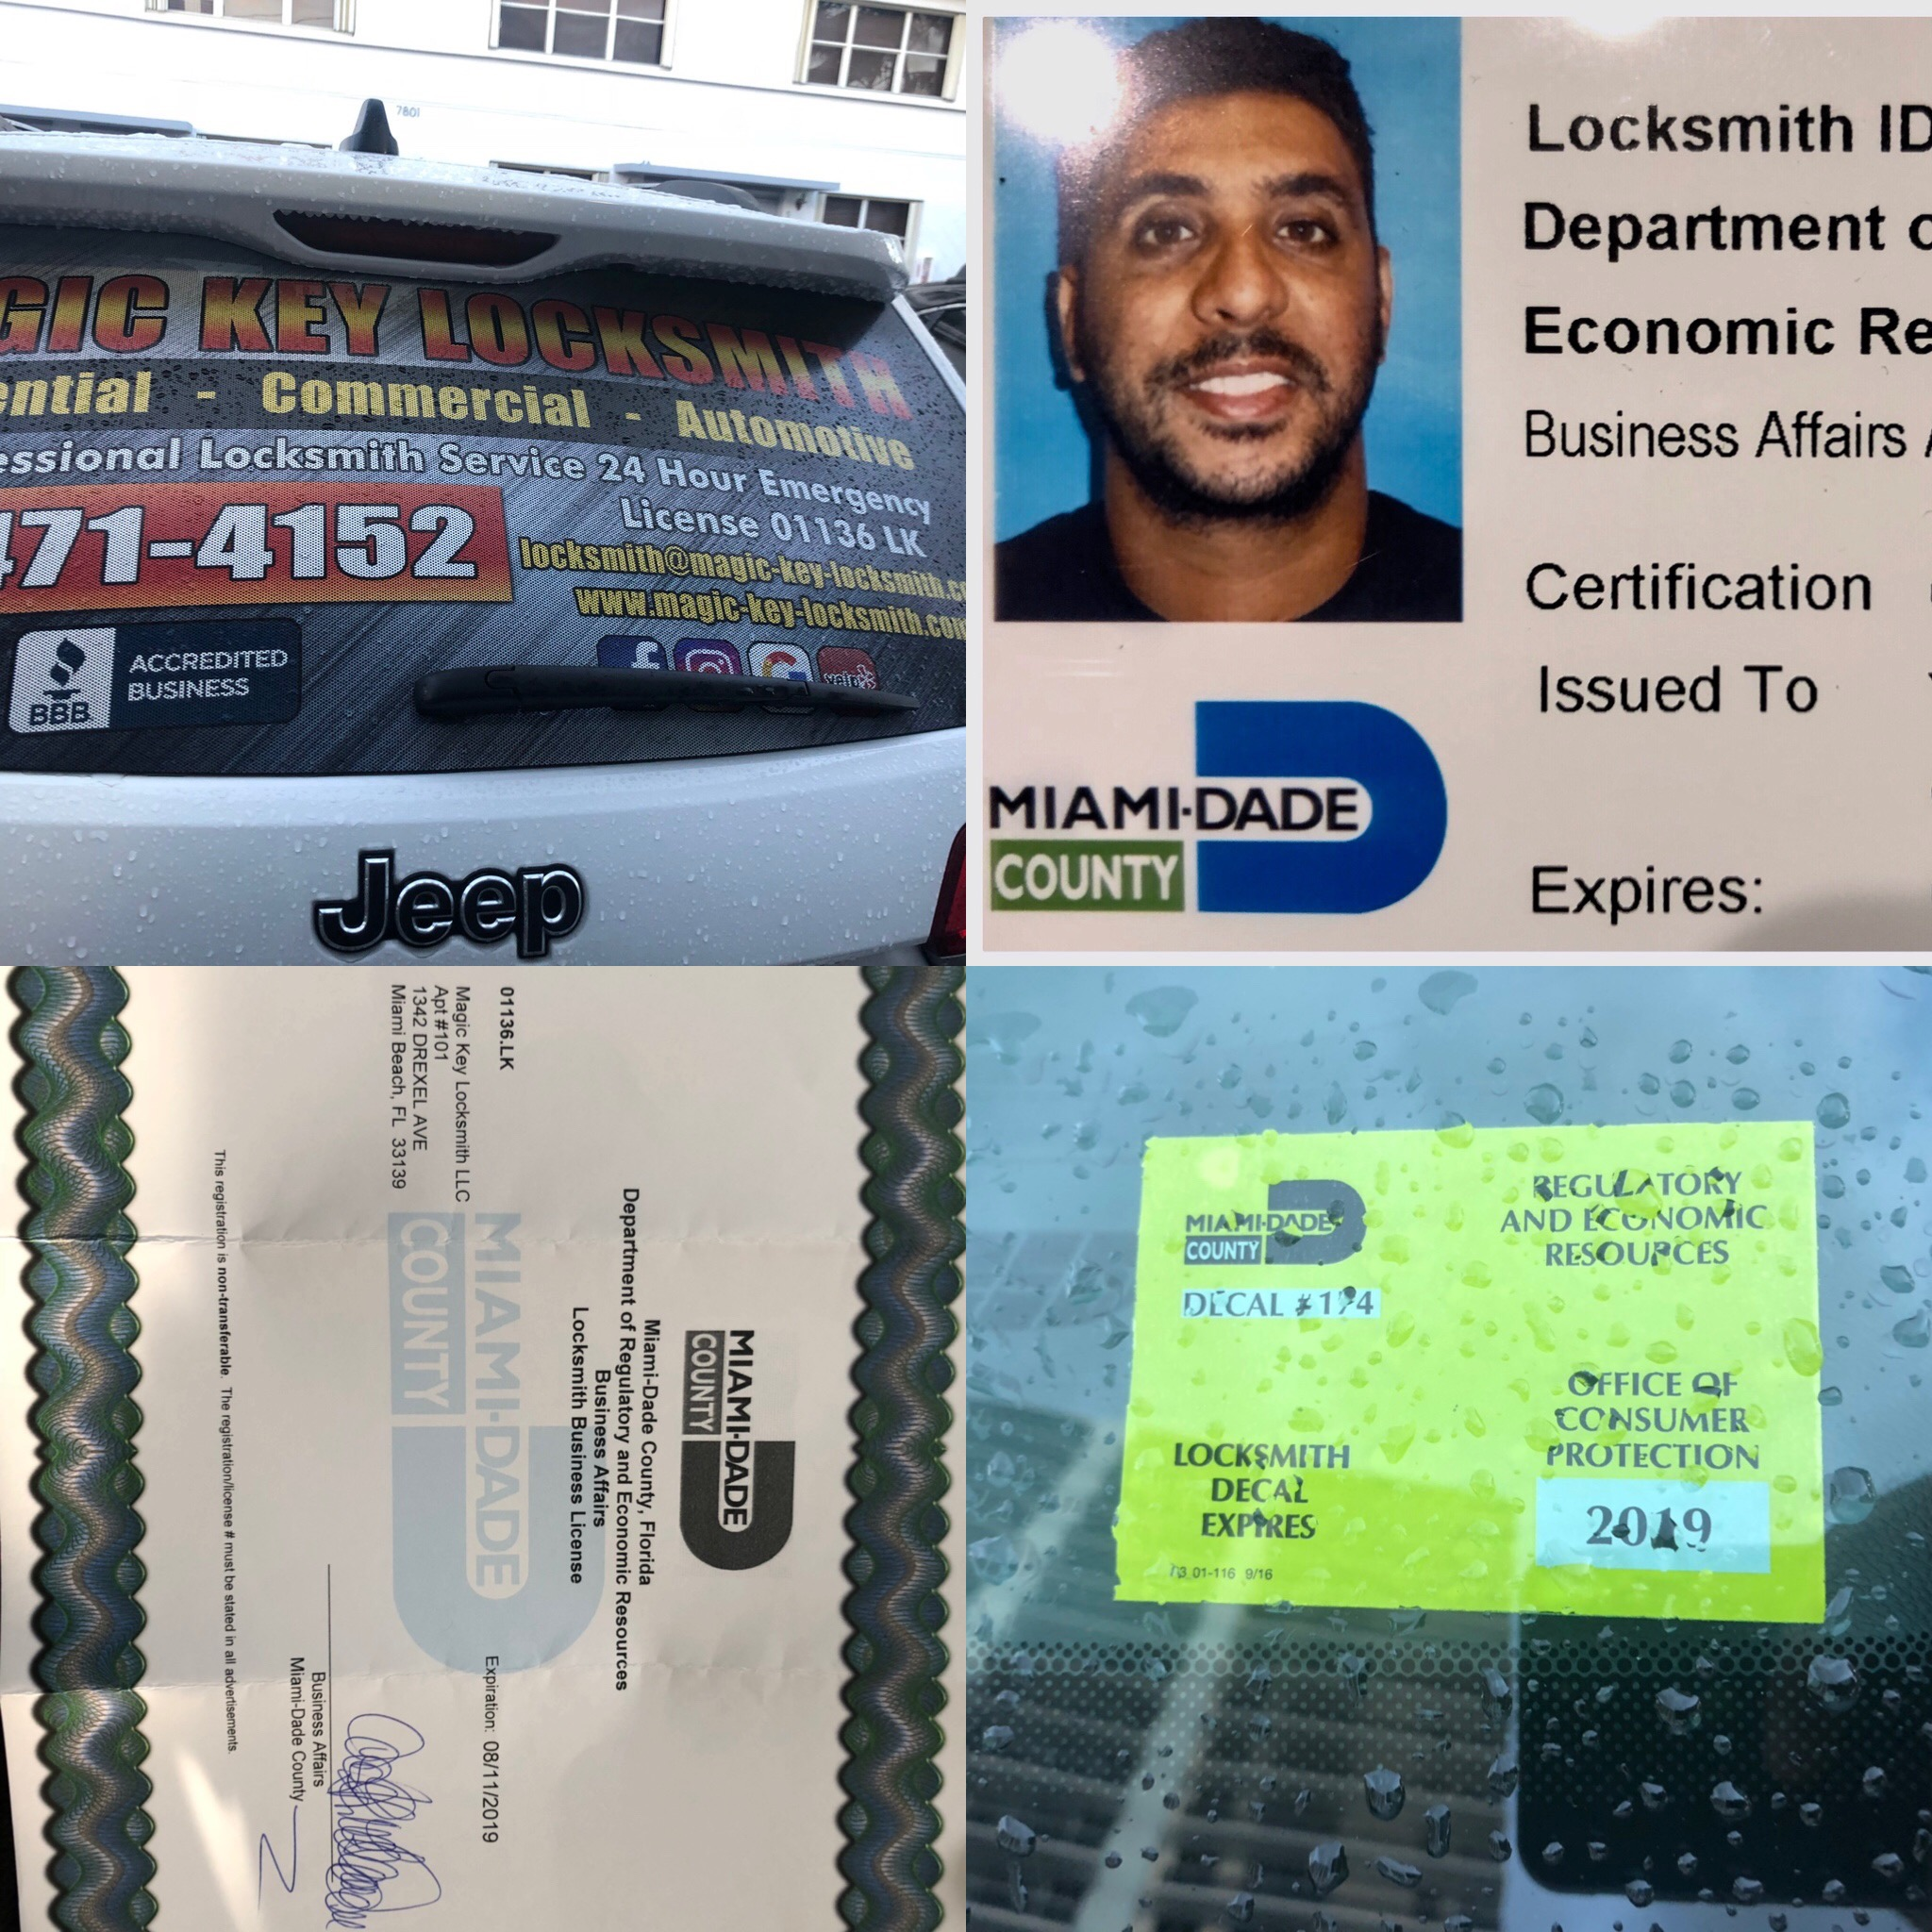 LOCKSMITH licenses